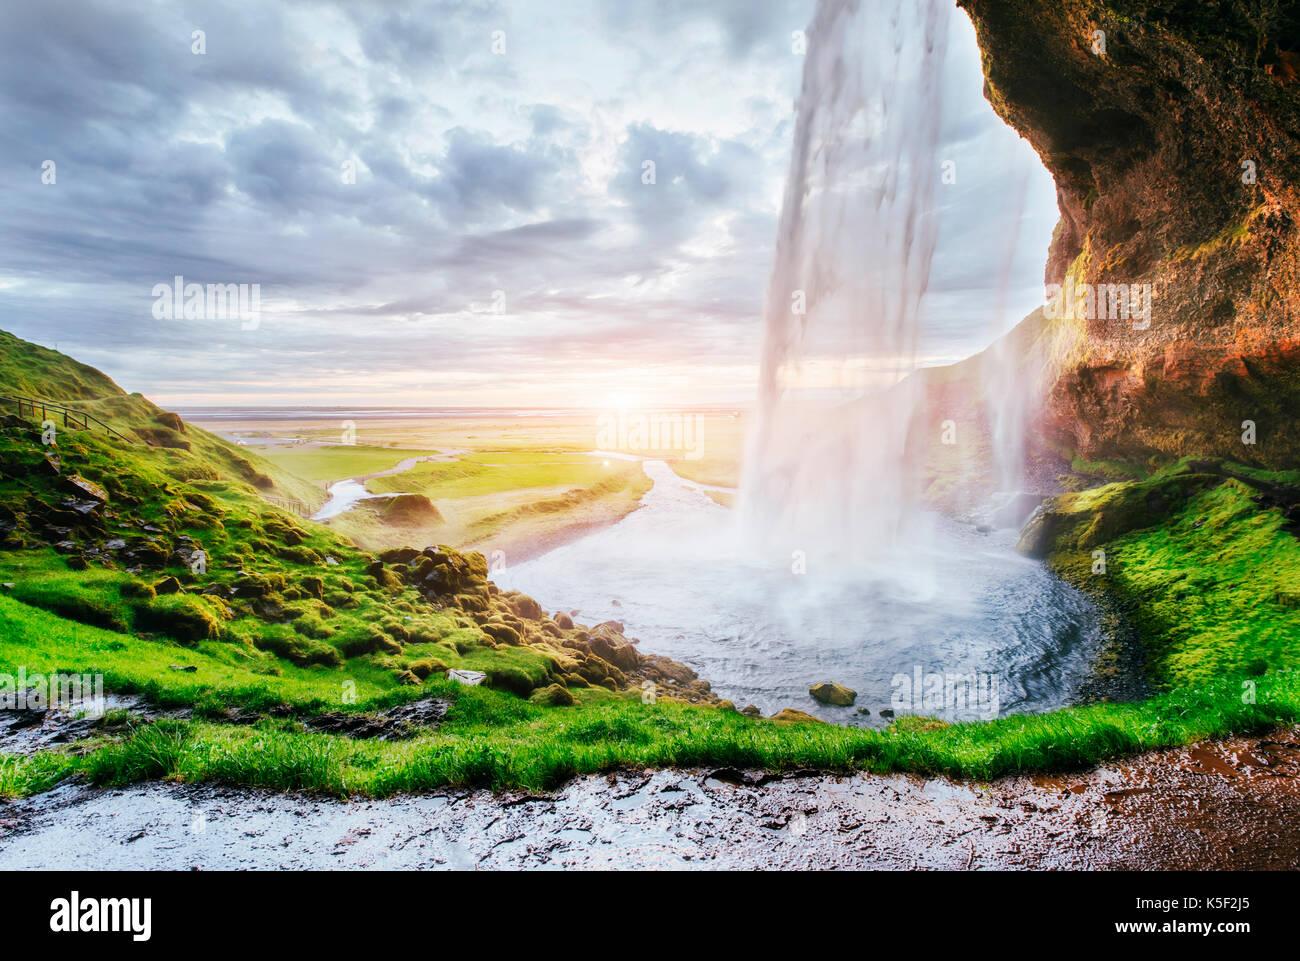 Cascada seljalandfoss al atardecer. Puente sobre el río. fantástica naturaleza de Islandia. Imagen De Stock